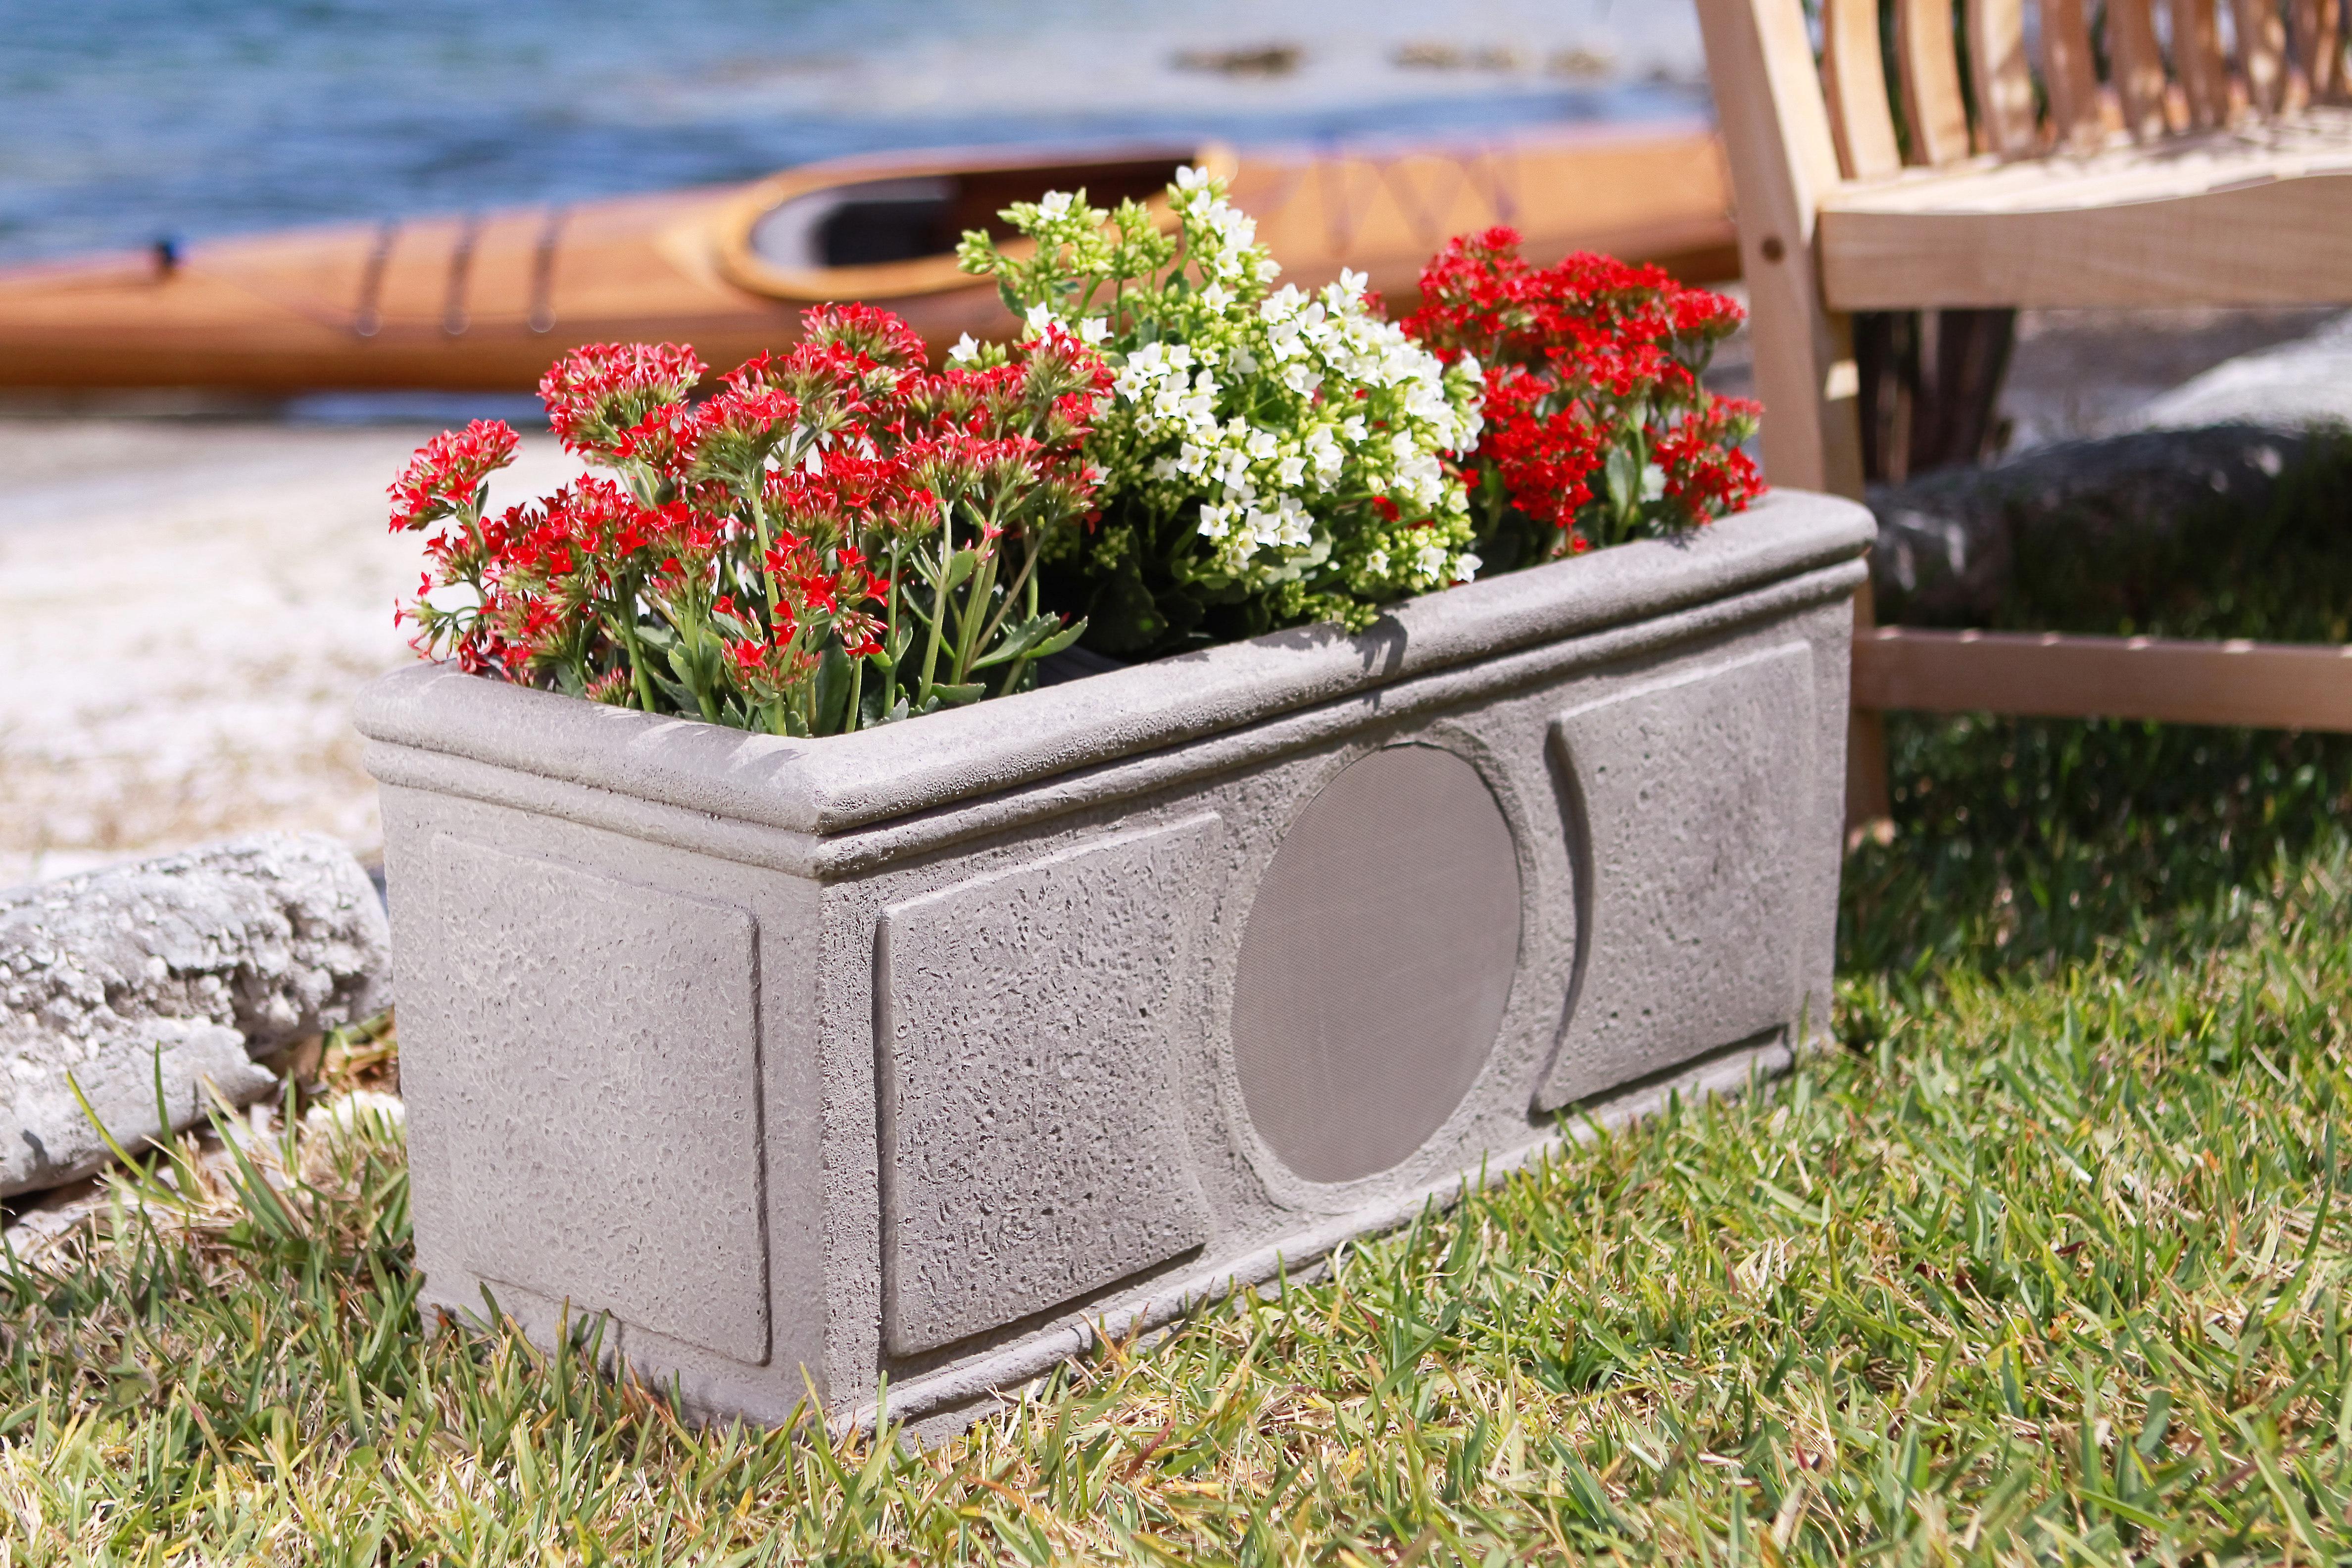 Niles PB6SI PRO Weathered Concrete 6-inch 2-Way High Performance Planter Box Loudspeaker